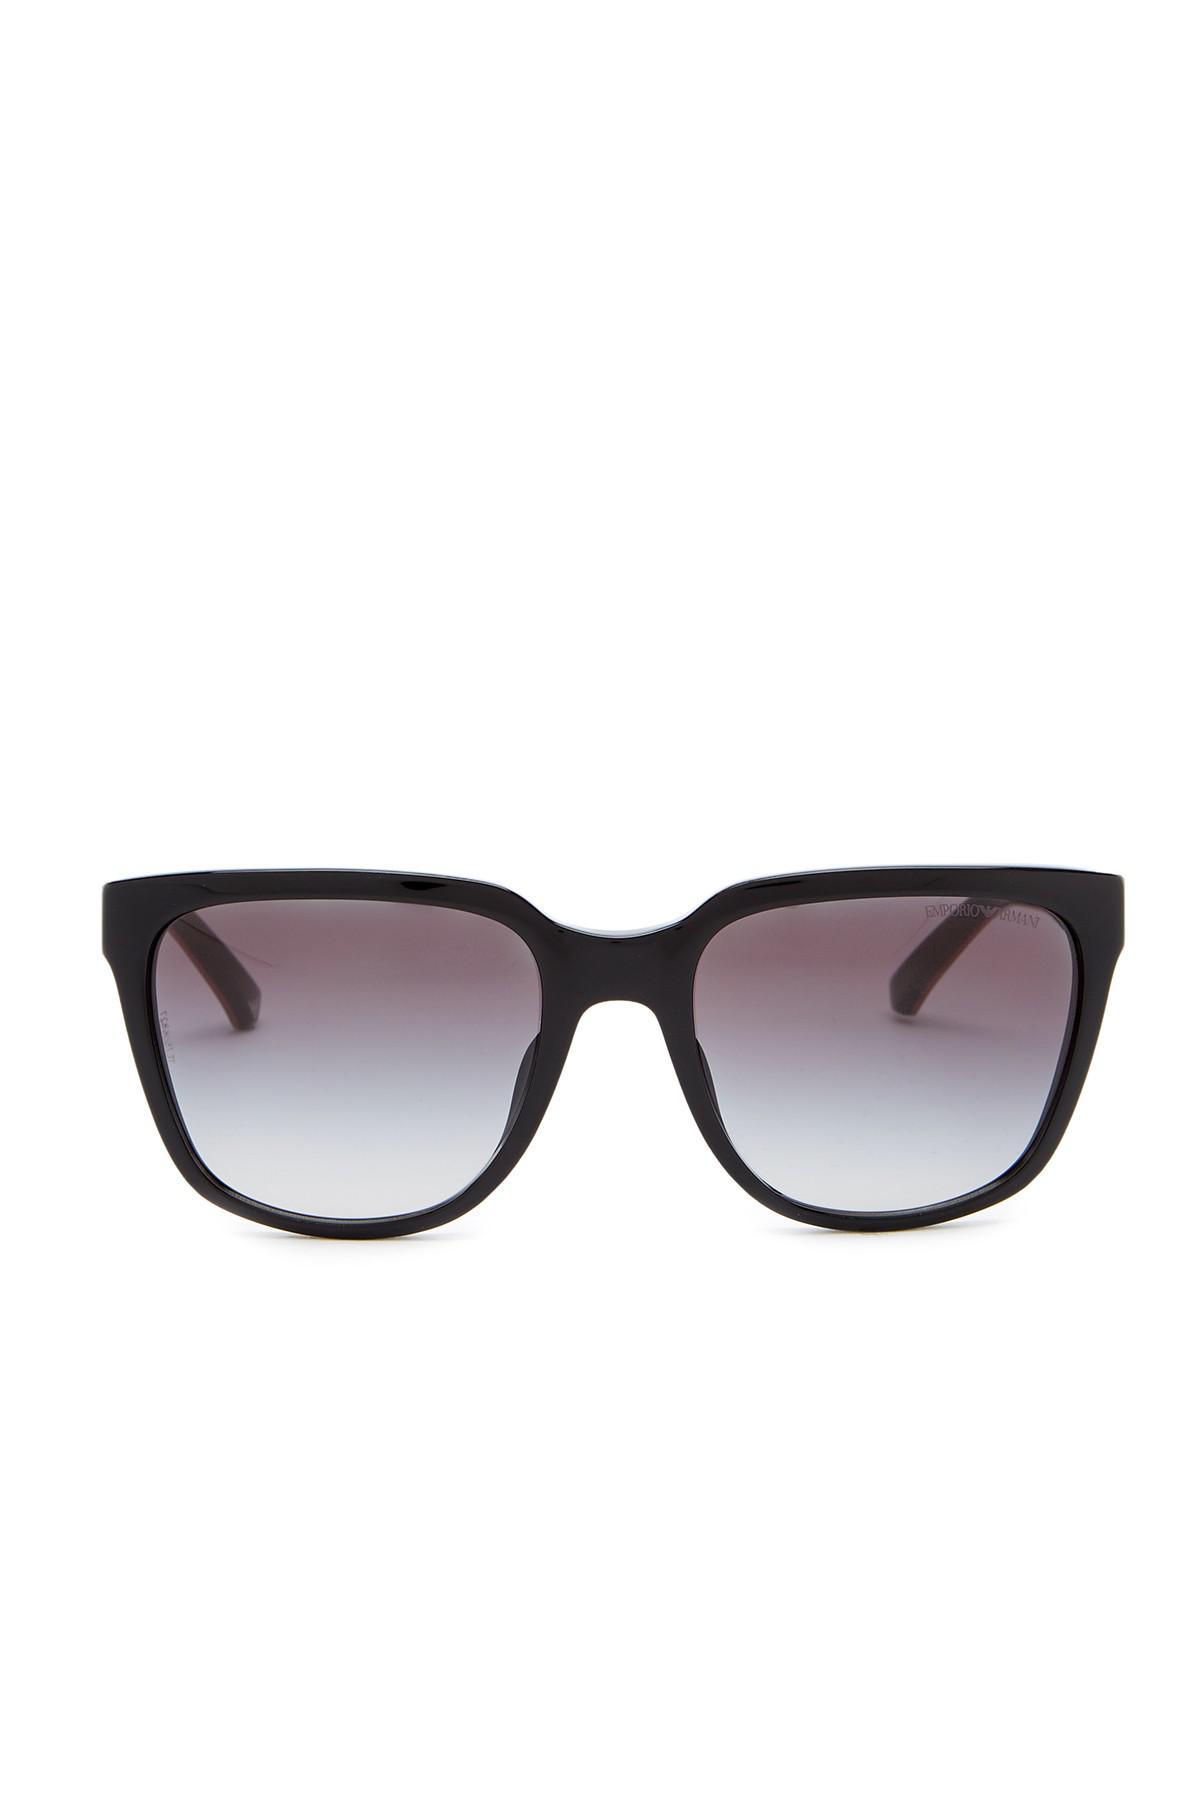 dff40a0f2eca Lyst - Emporio Armani 55mm Wayfarer Acetate Frame Sunglasses in Black